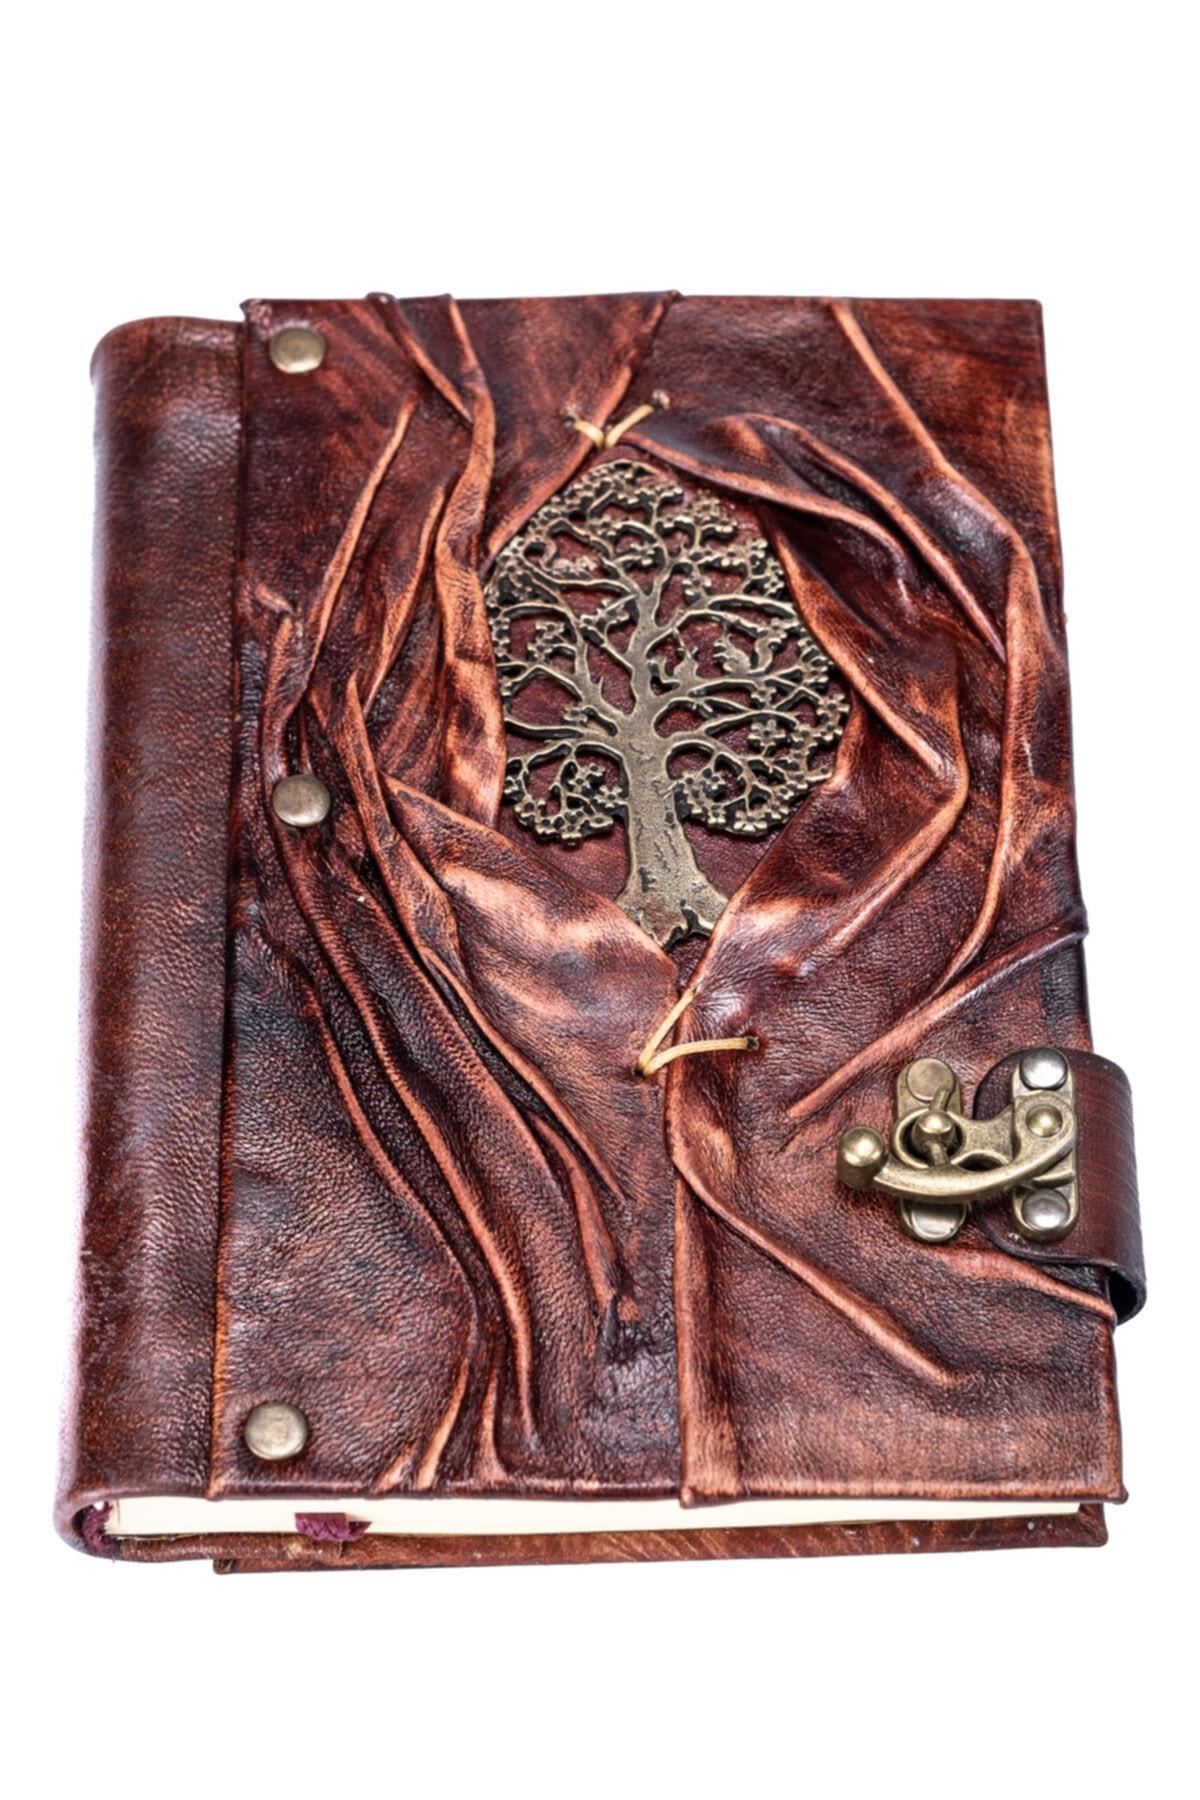 Handmade Genuine Leather Souvenir Book Casual vintage daily keep note handmade travel notepad notebook brown genuine